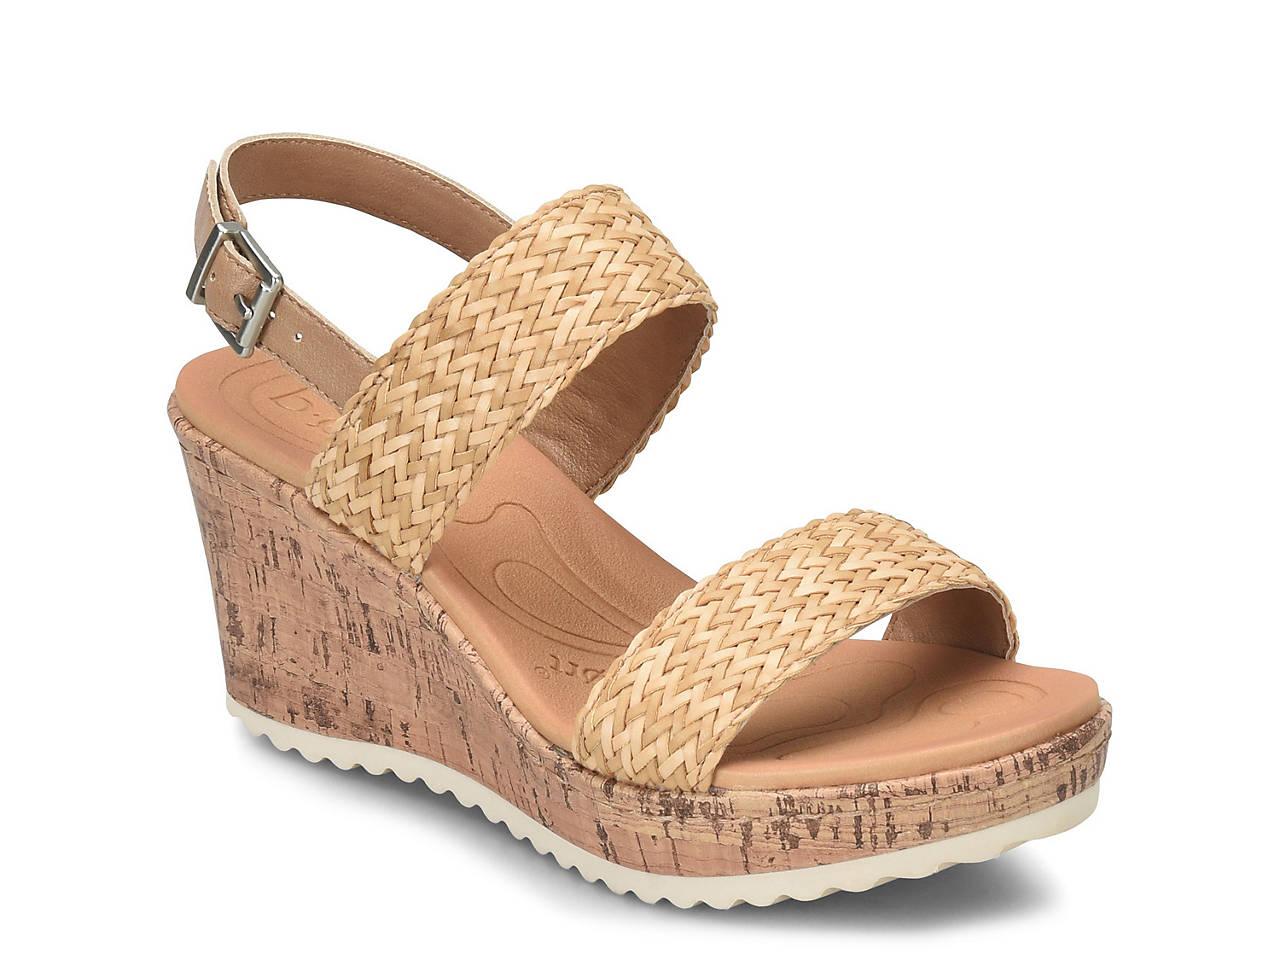 f5e04e3f754 b.o.c Remi Wedge Sandal Women s Shoes